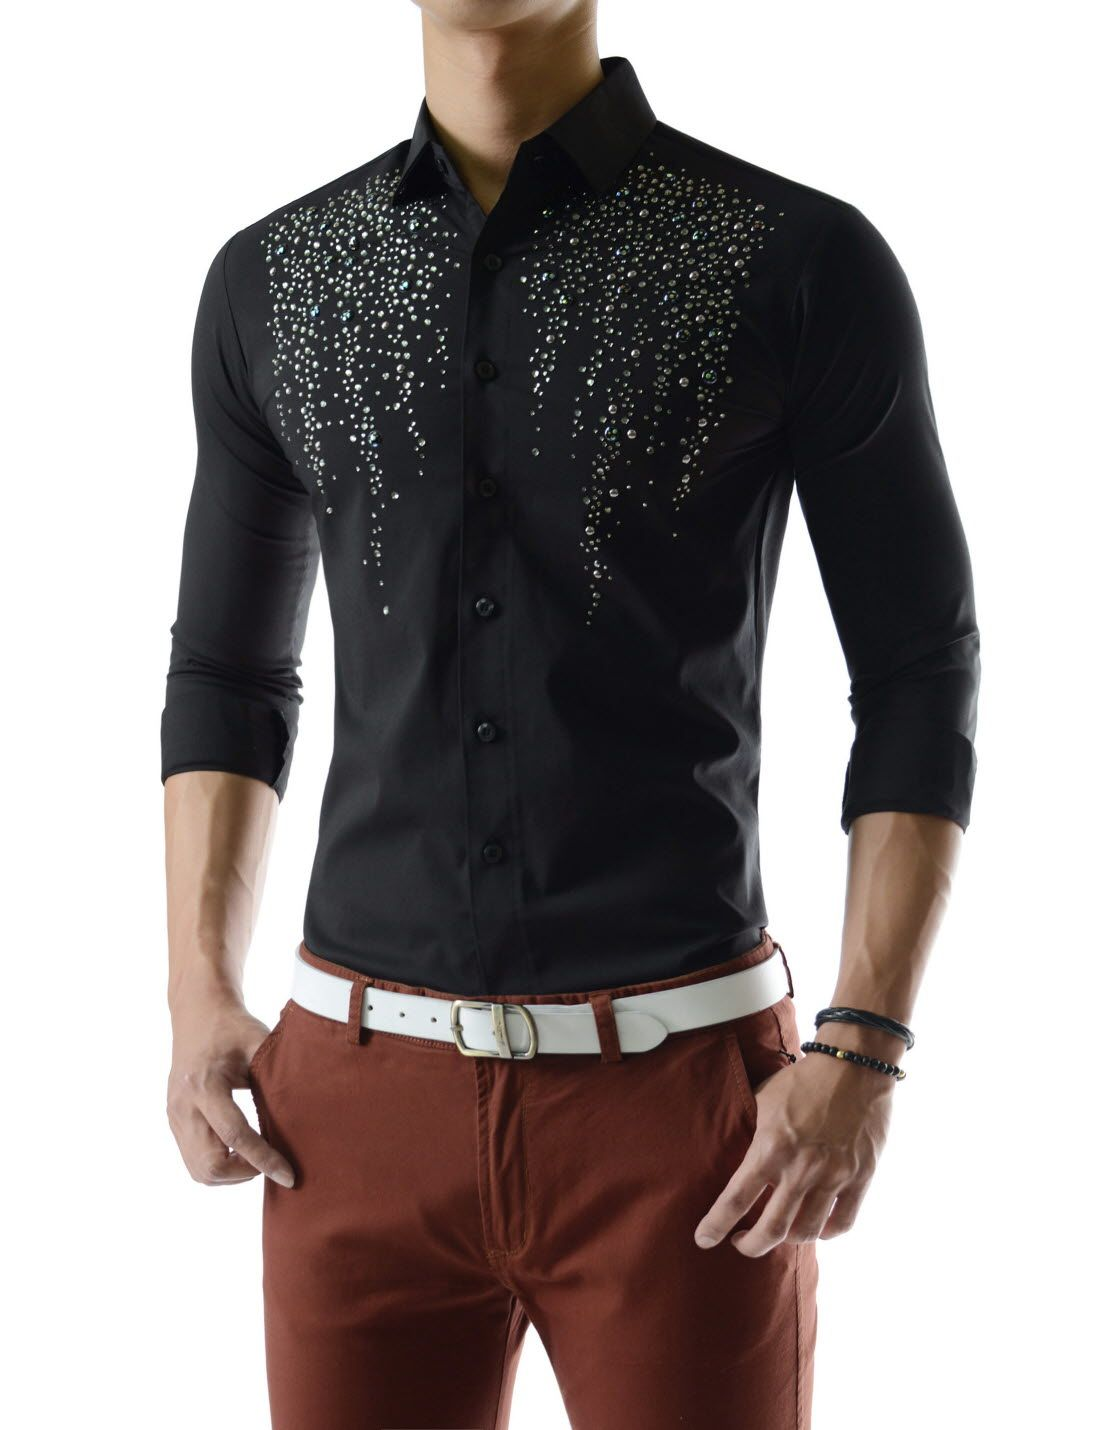 Splendid Stretchy Shine Rhinestones Long Sleeve Metallic Beads Shirts